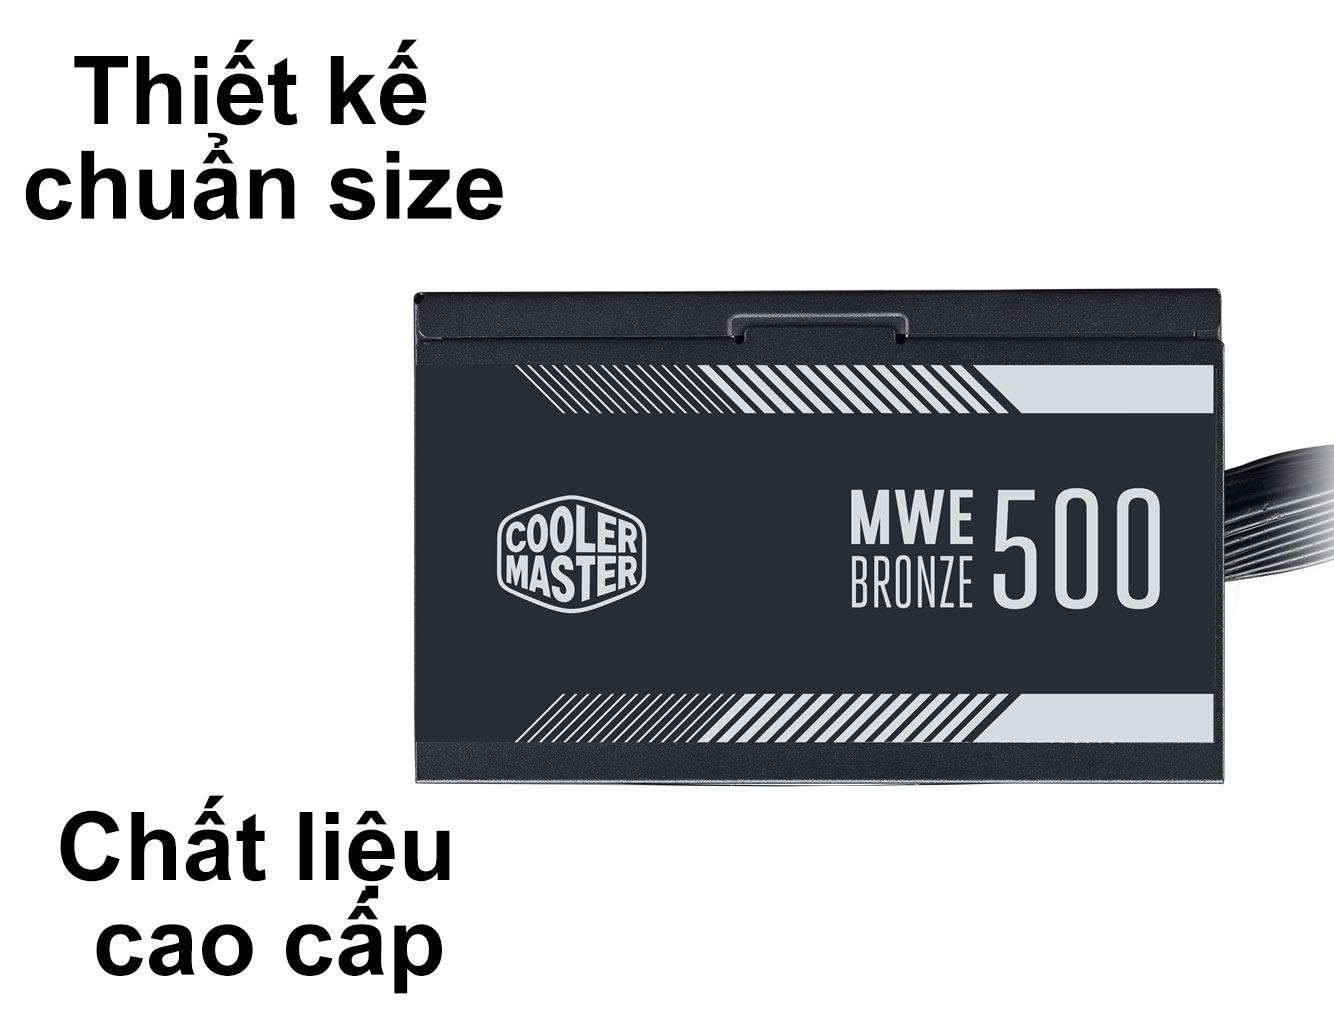 Bộ nguồn Power CM MWE Bronze 500W V2 230V | Thiết kế chuẩn Size